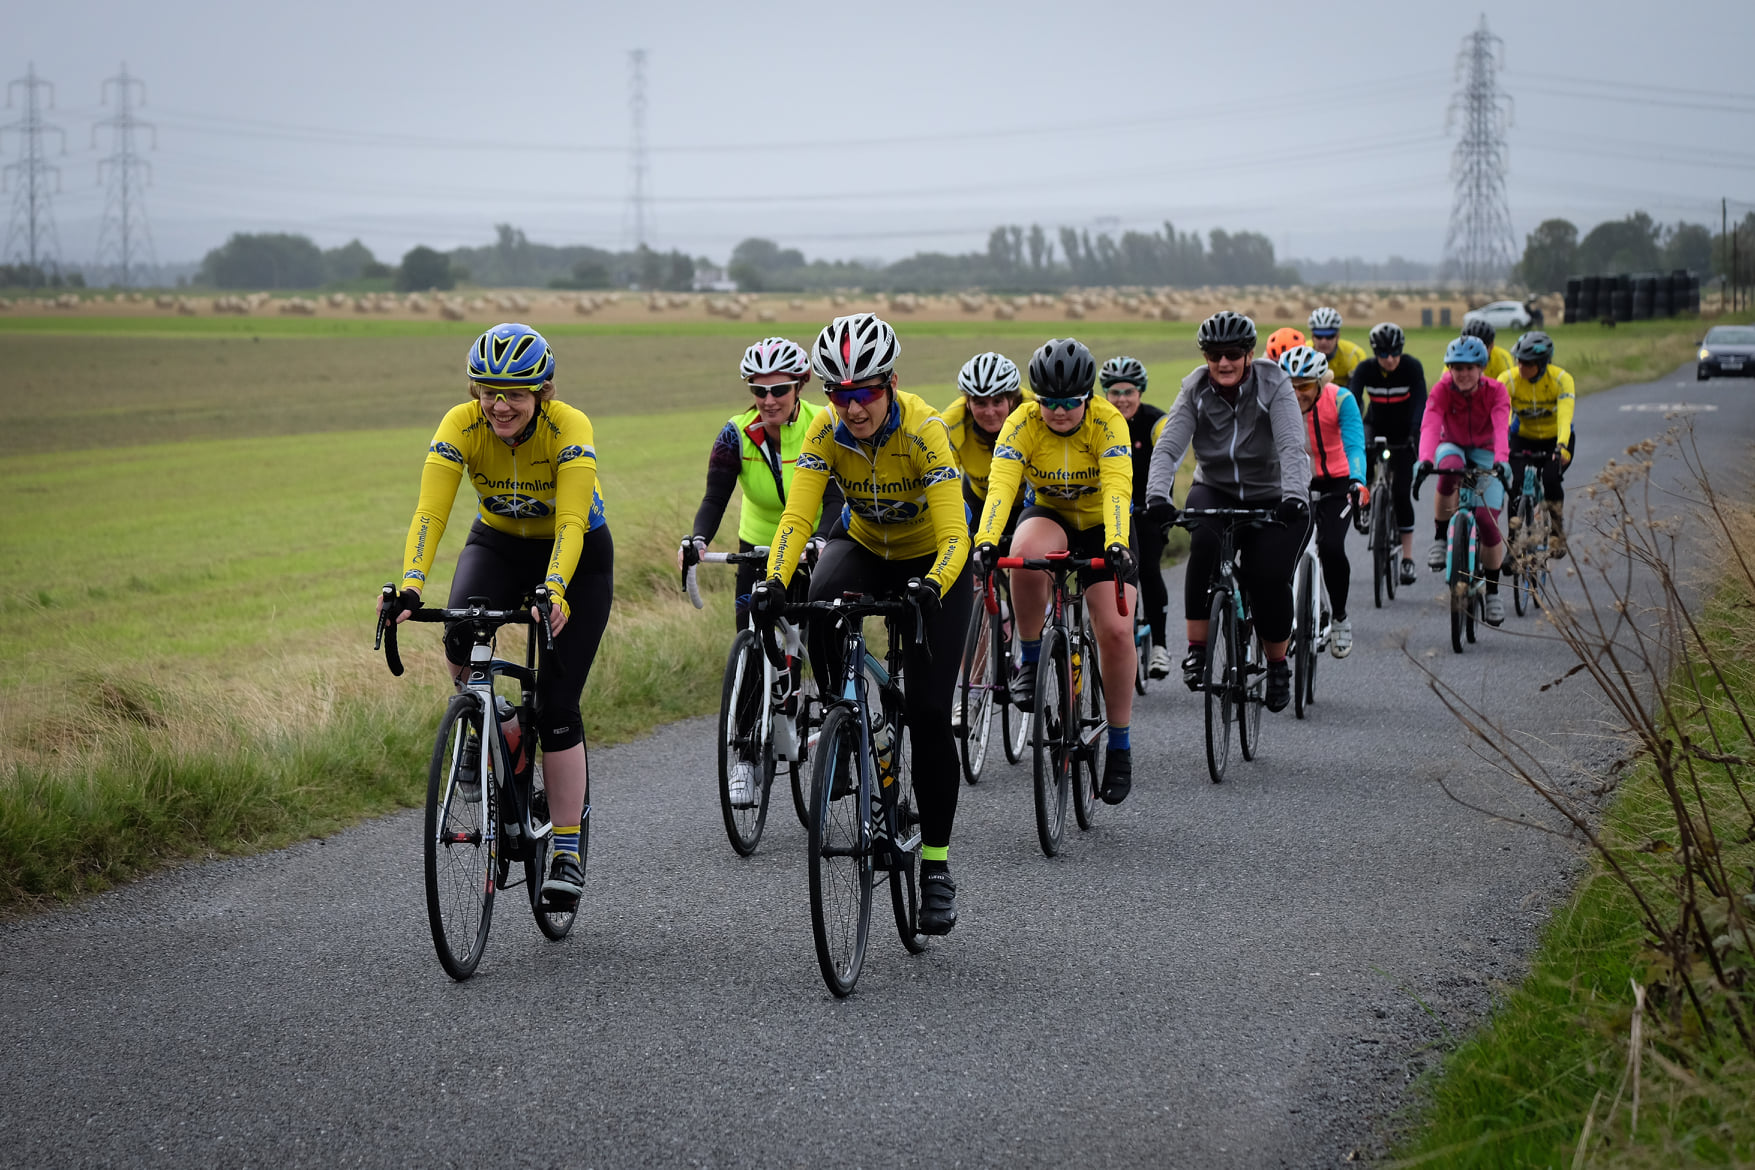 Dunfermline Cycling Club ladies ride